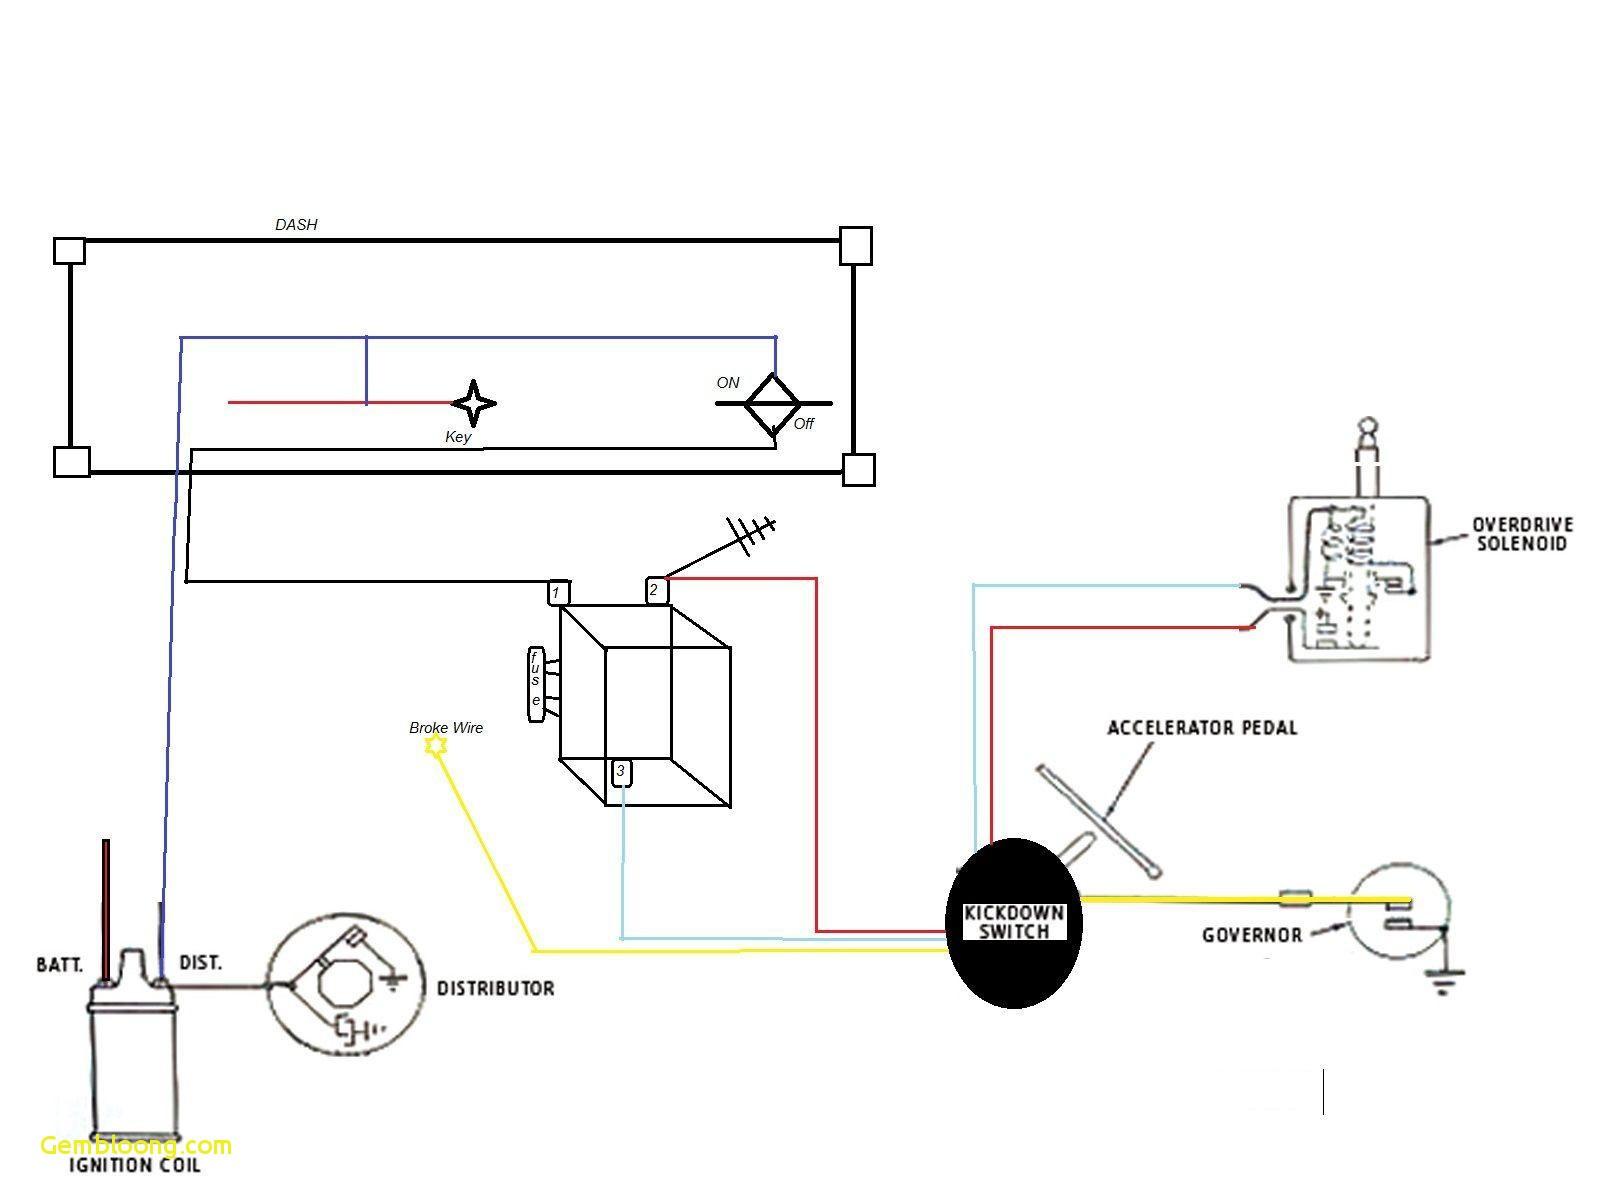 Truck Drivetrain Diagram 1939 ford Truck Wiring Diagram Another Blog About Wiring Diagram • Of Truck Drivetrain Diagram